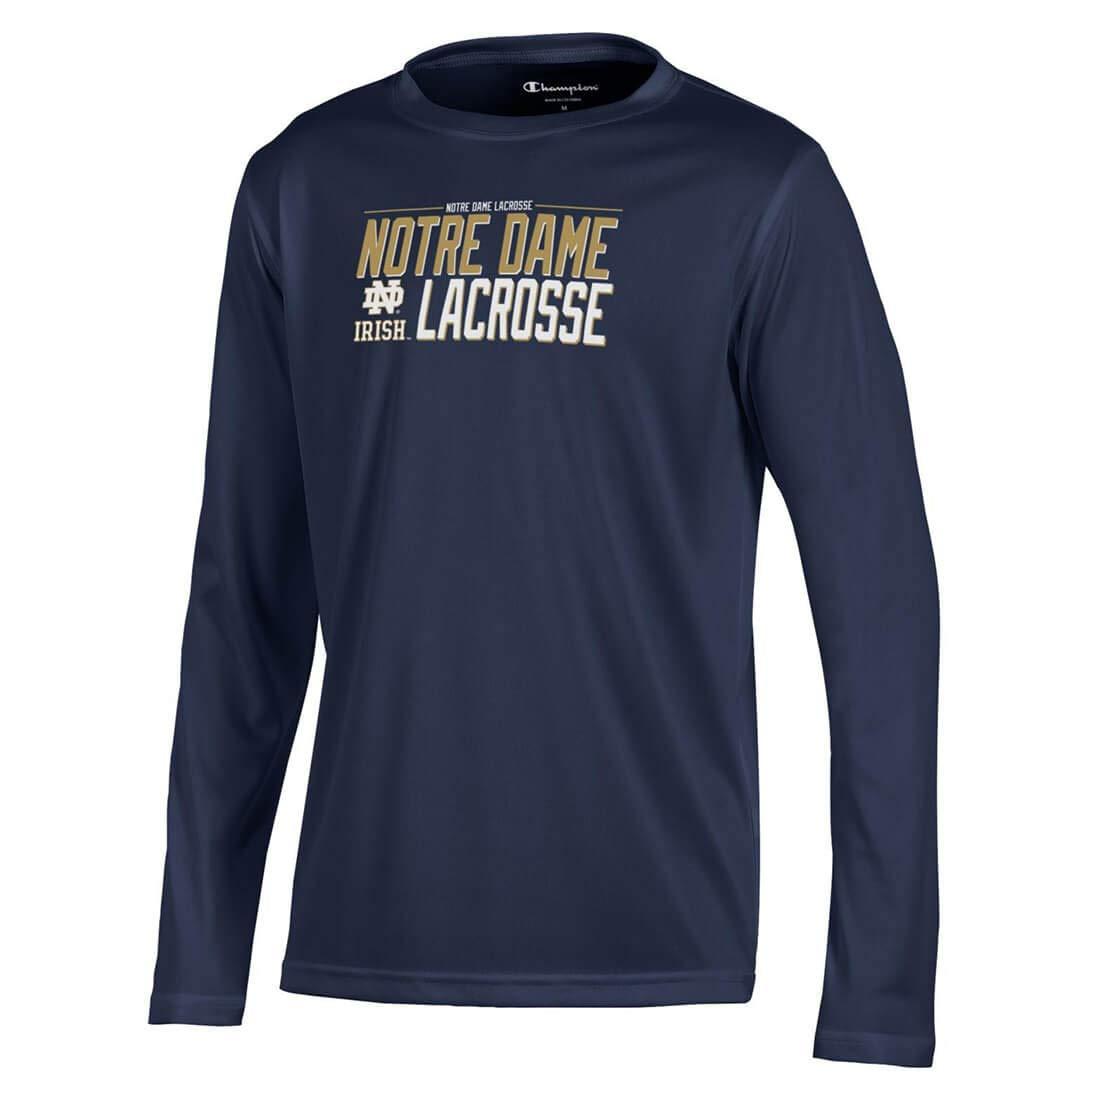 Notre Dame Fighting Irish Lacrosse Long Sleeve Lacrosse Unlimited ...